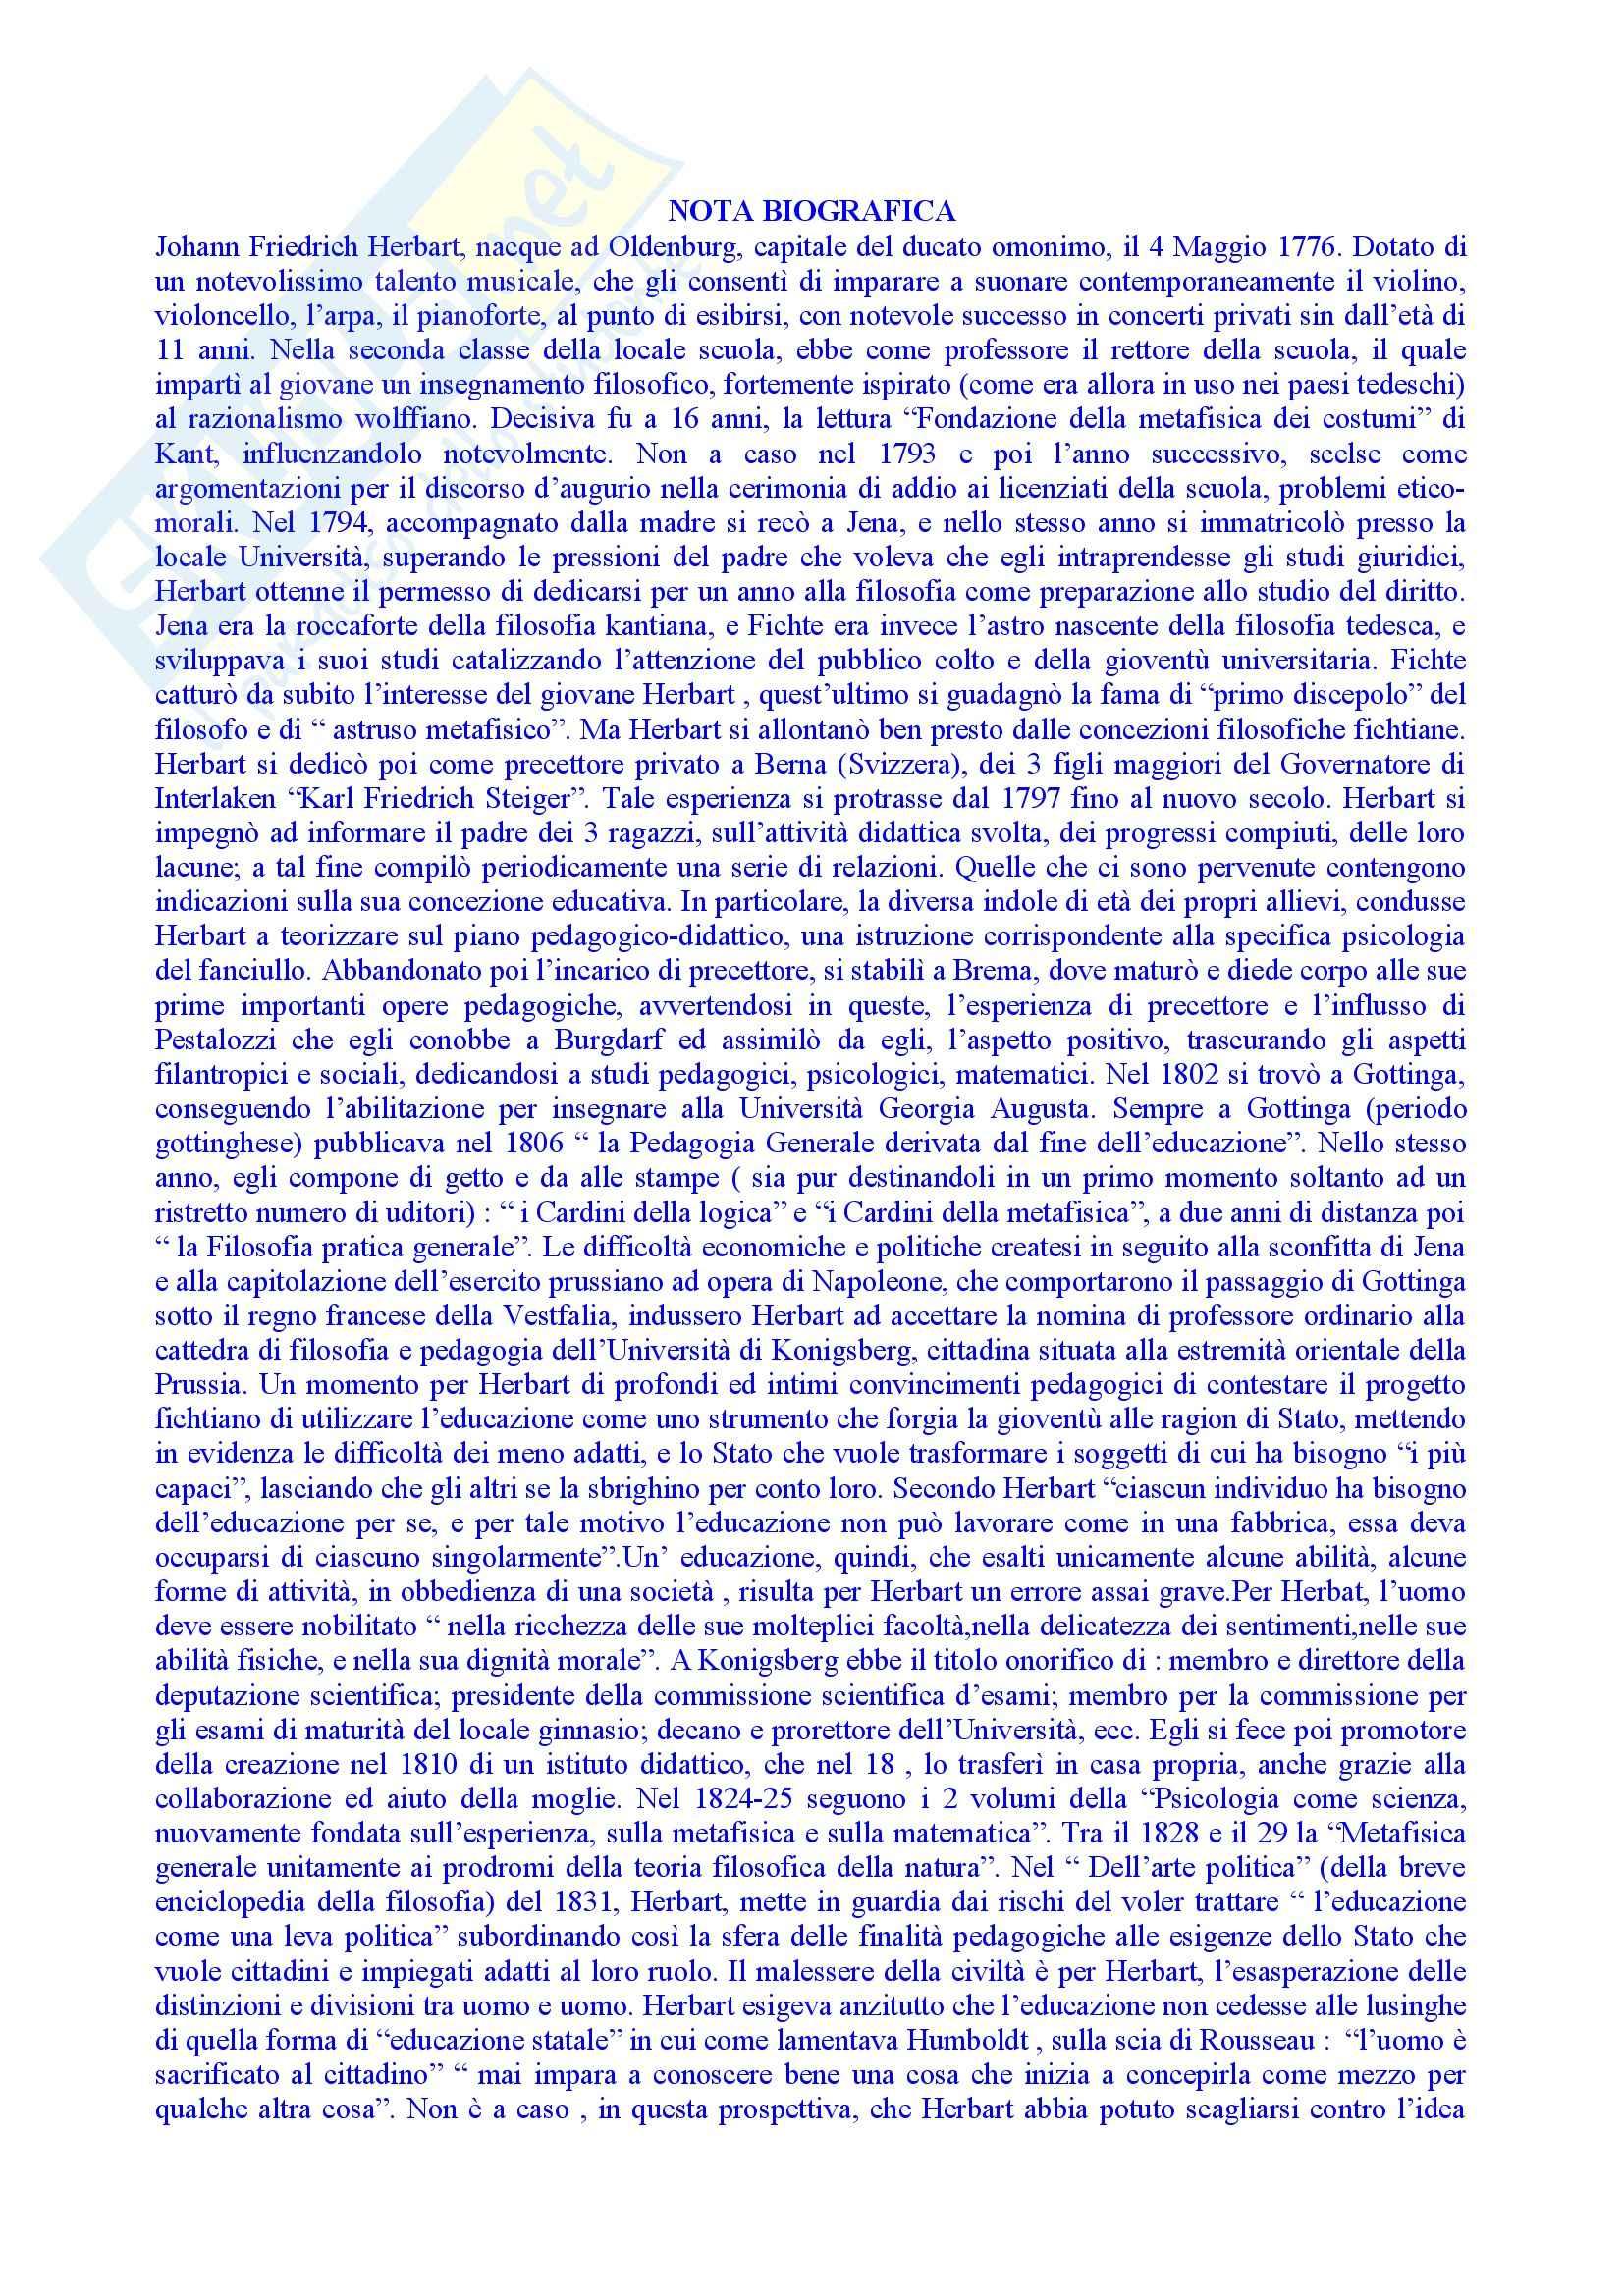 appunto G. Spadafora Pedagogia generale